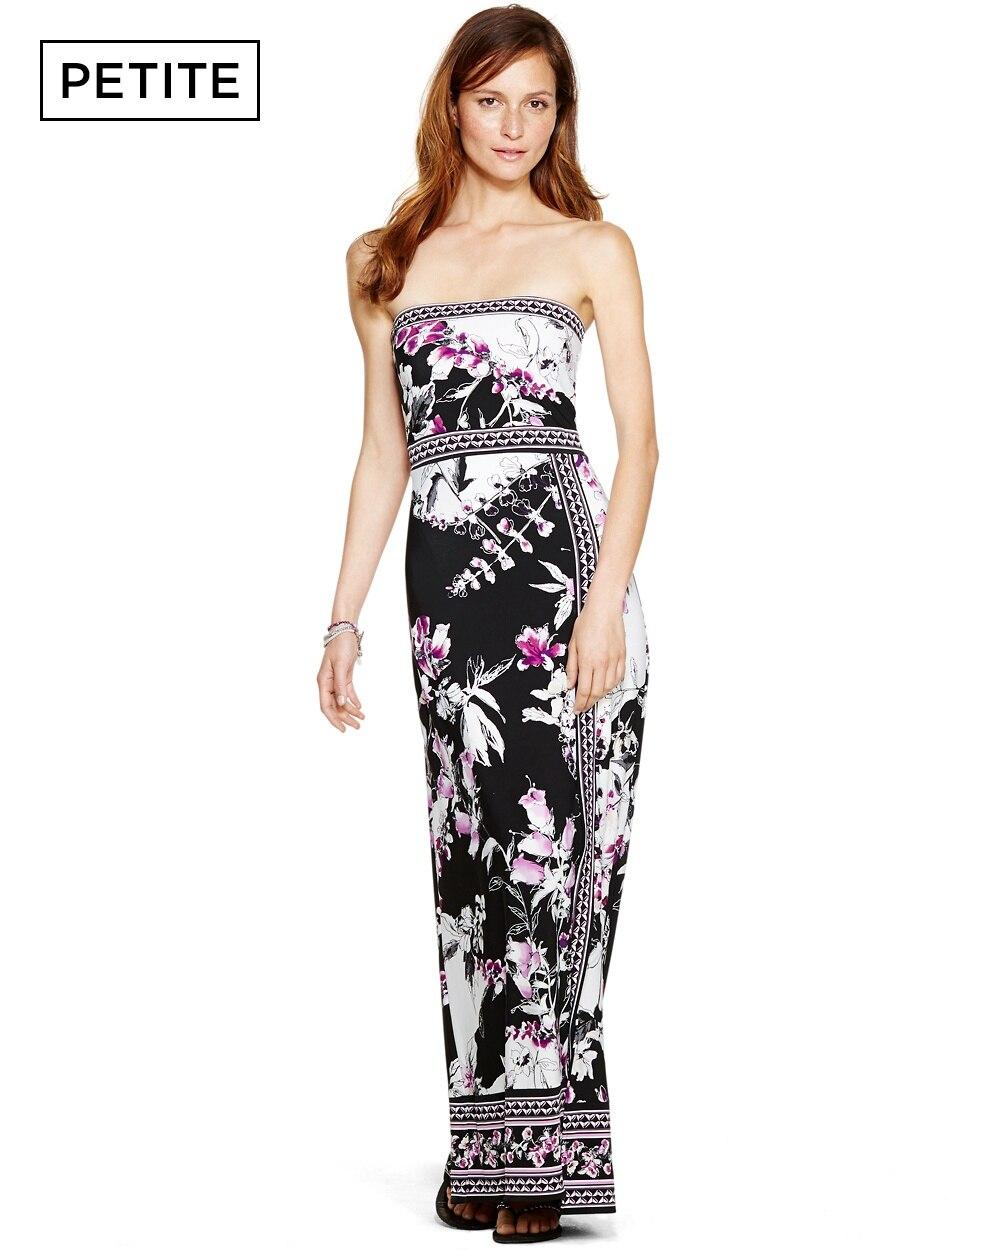 Petite Strapless Floral Print Maxi Dress White House Black Market